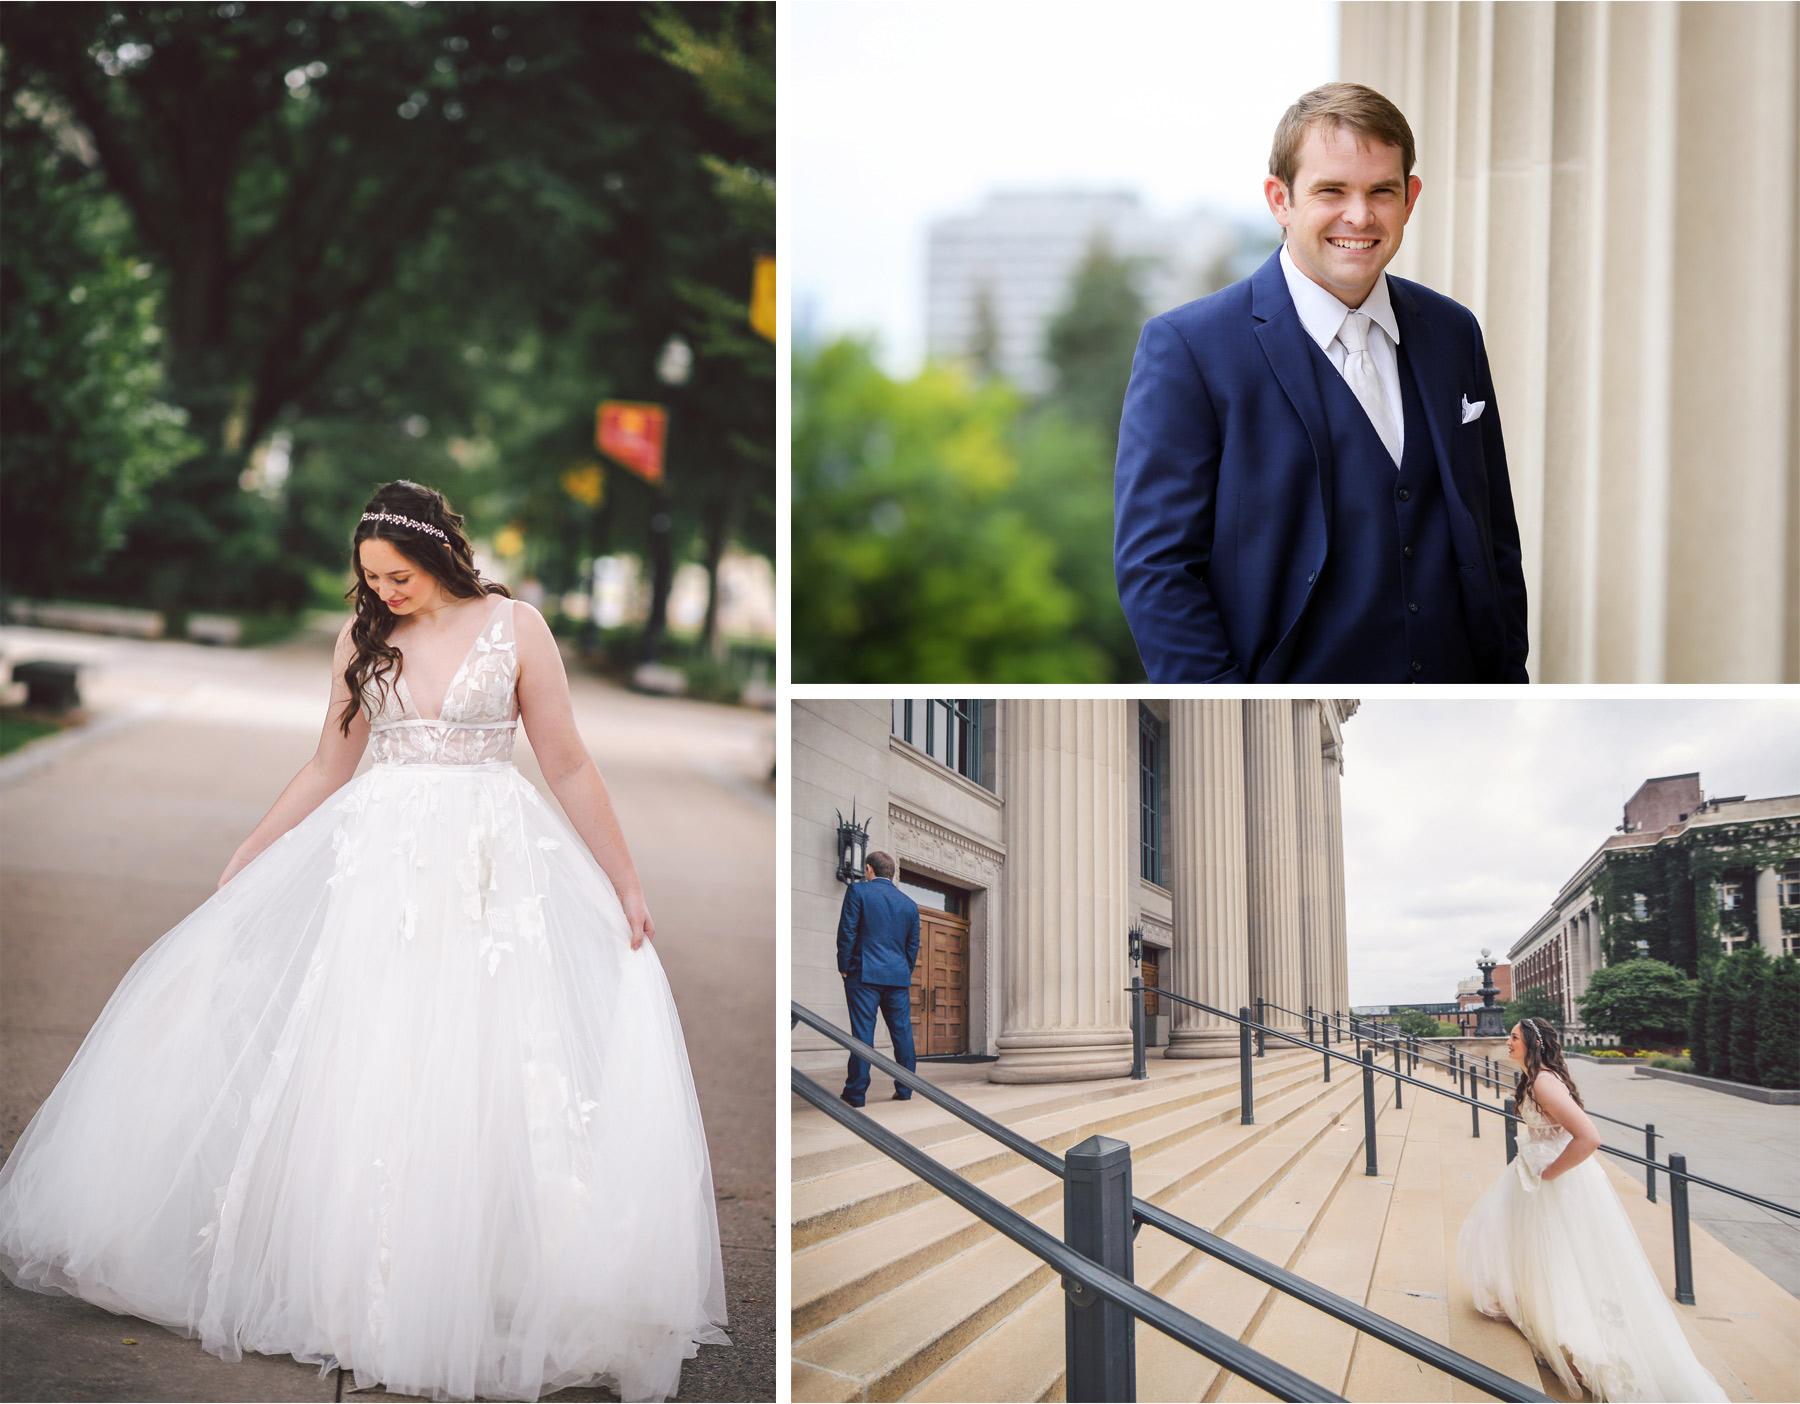 02-Saint-Paul-Minnesota-Wedding-Photography-by-Vick-Photography-Saint-Paul-Athletic-Club-First-Look-Kelsey-and-Jeffery.jpg